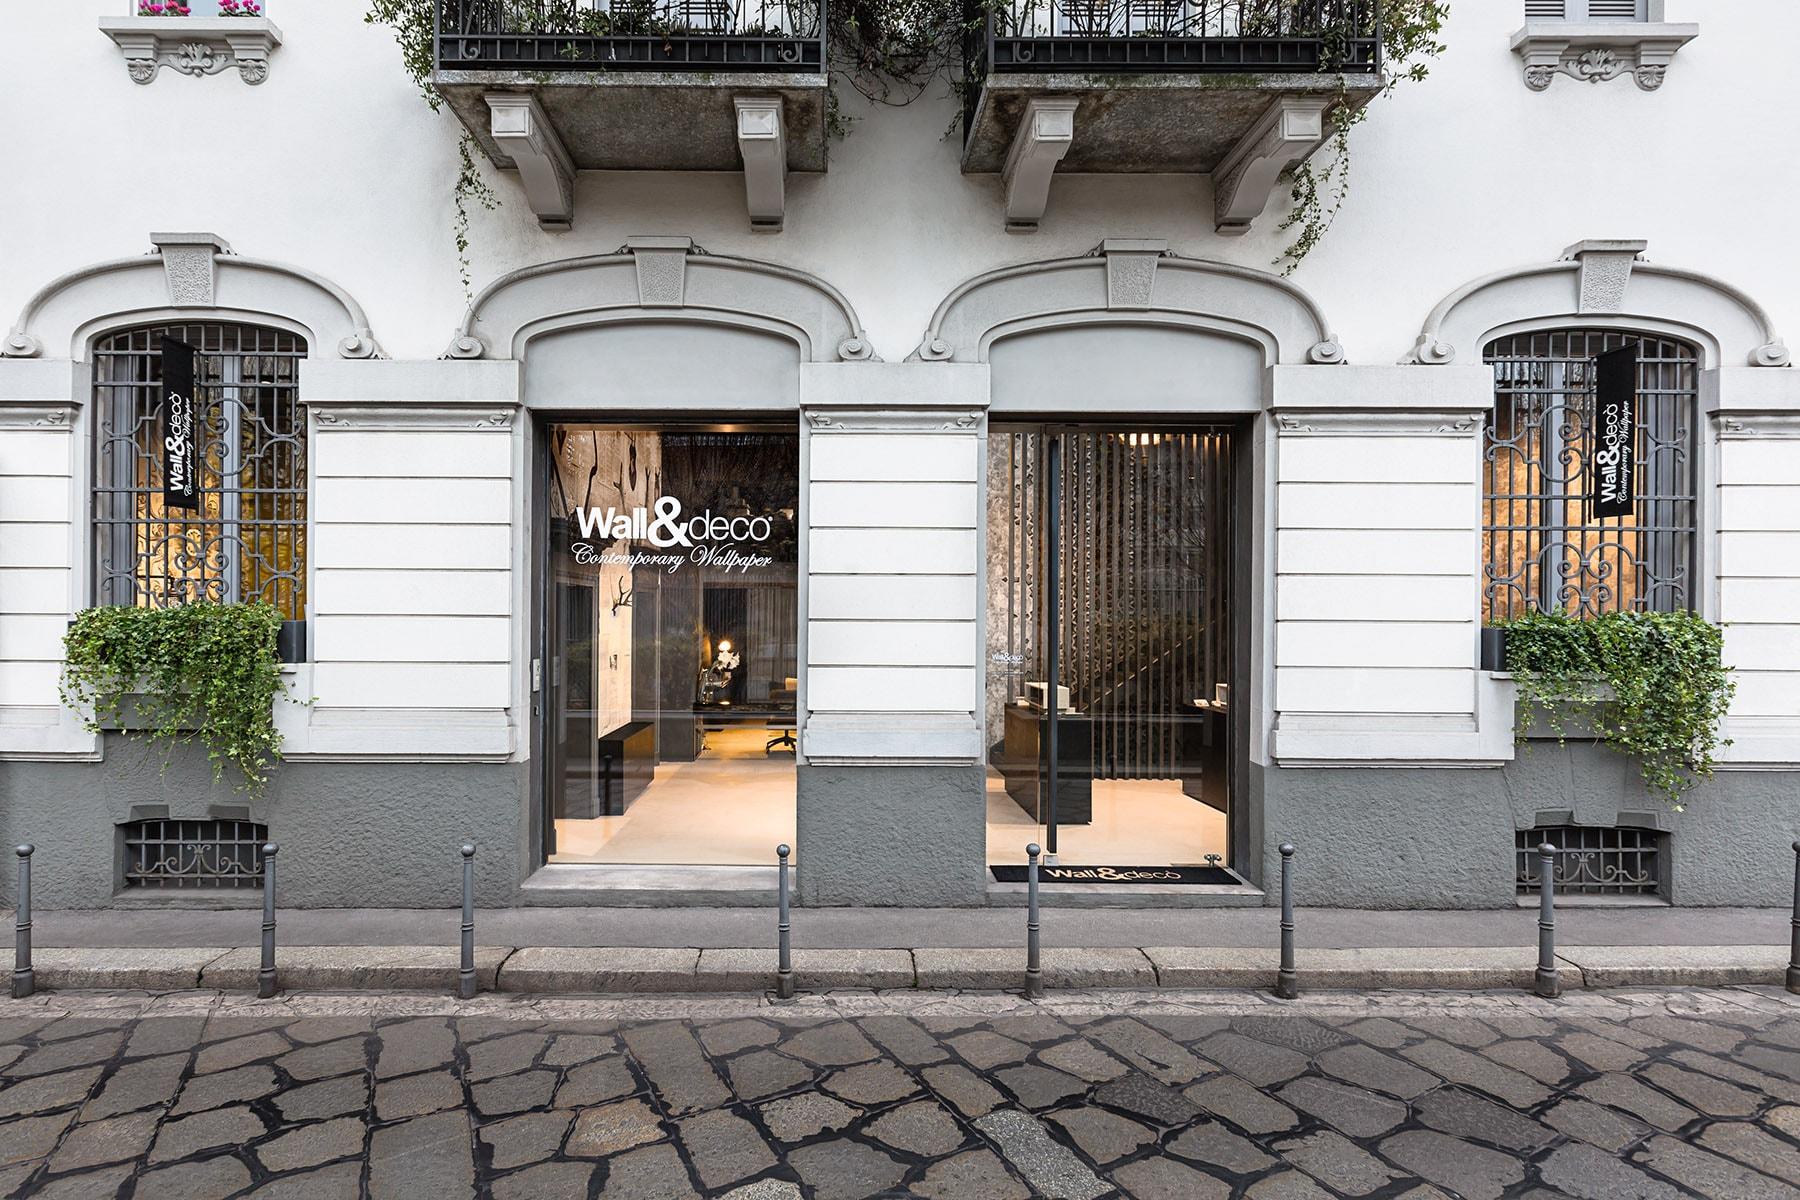 Nuova sede per Wall&decò a Milano